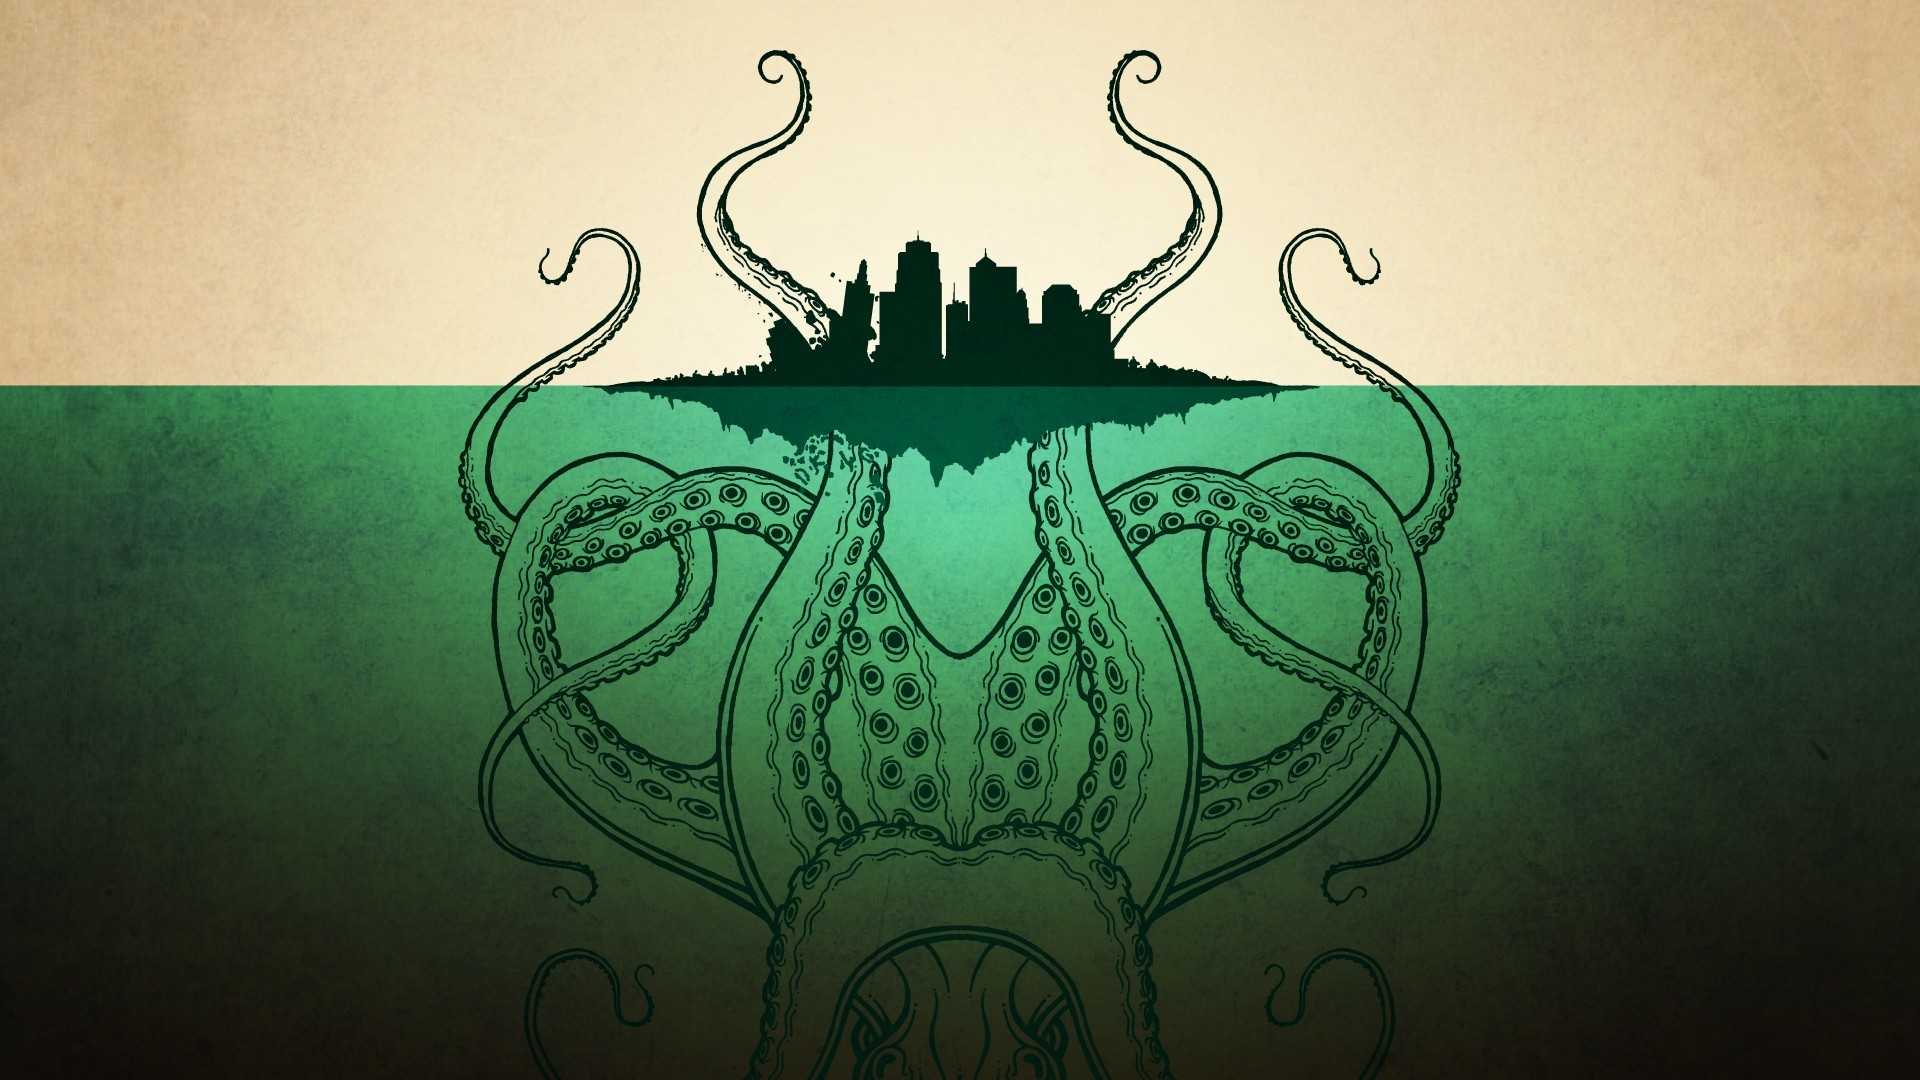 Octopus-HD-Wallpaper-| Download Free Desktop Wallpaper .